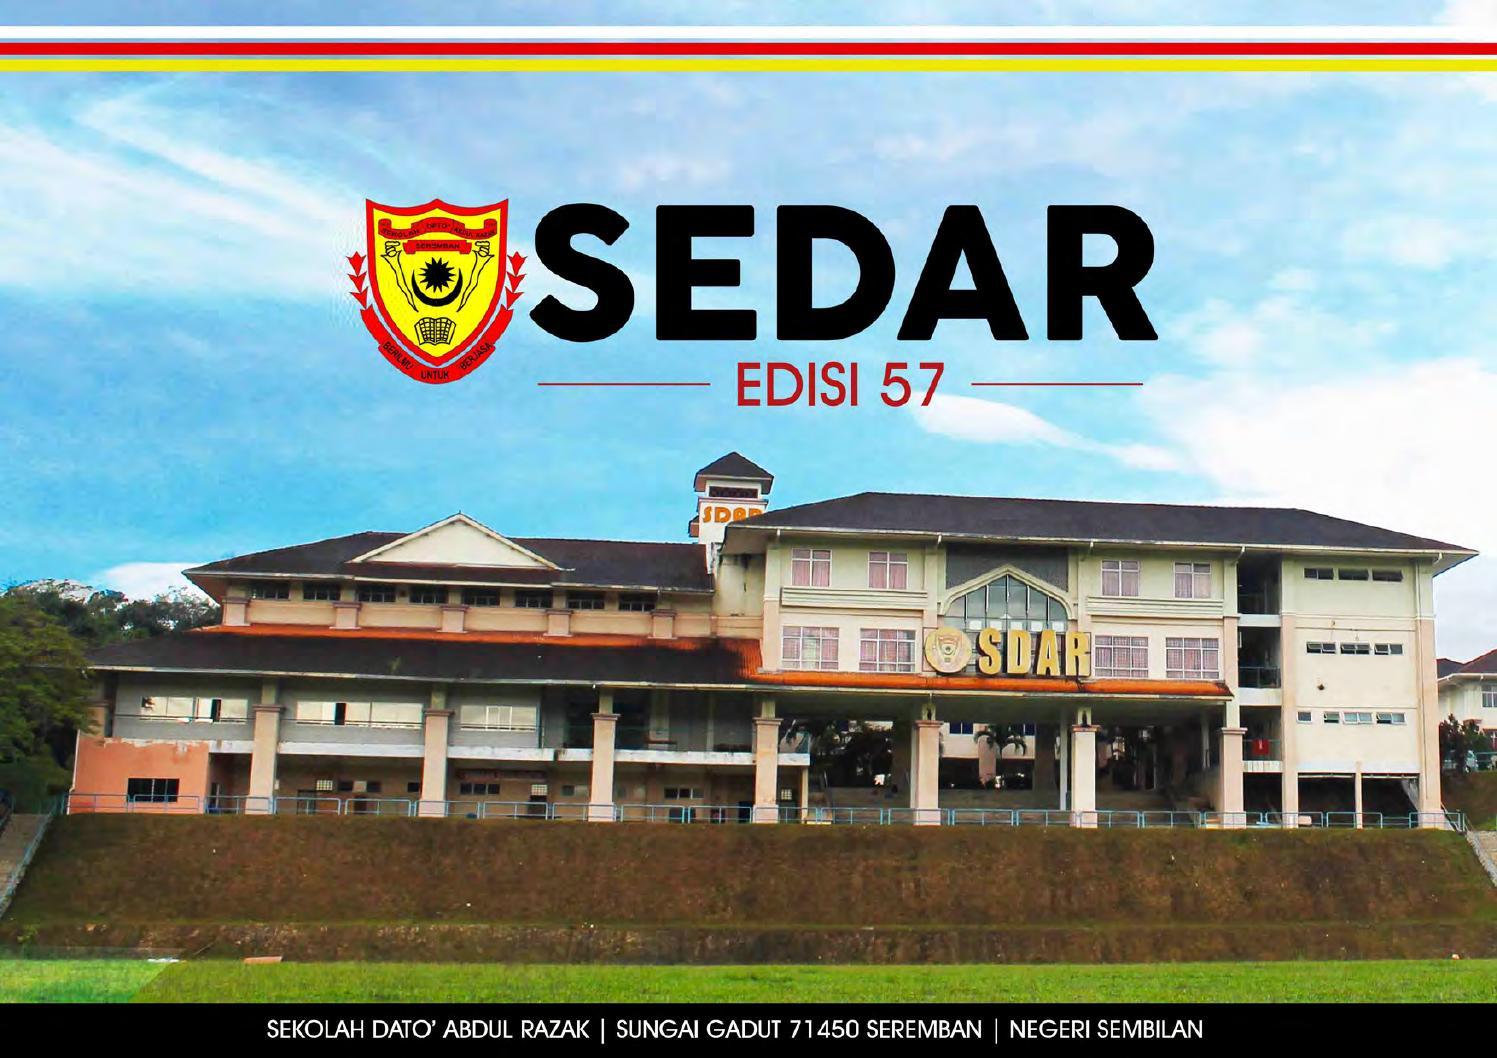 Sedar 2014 Magazine By Sedar14 Issuu